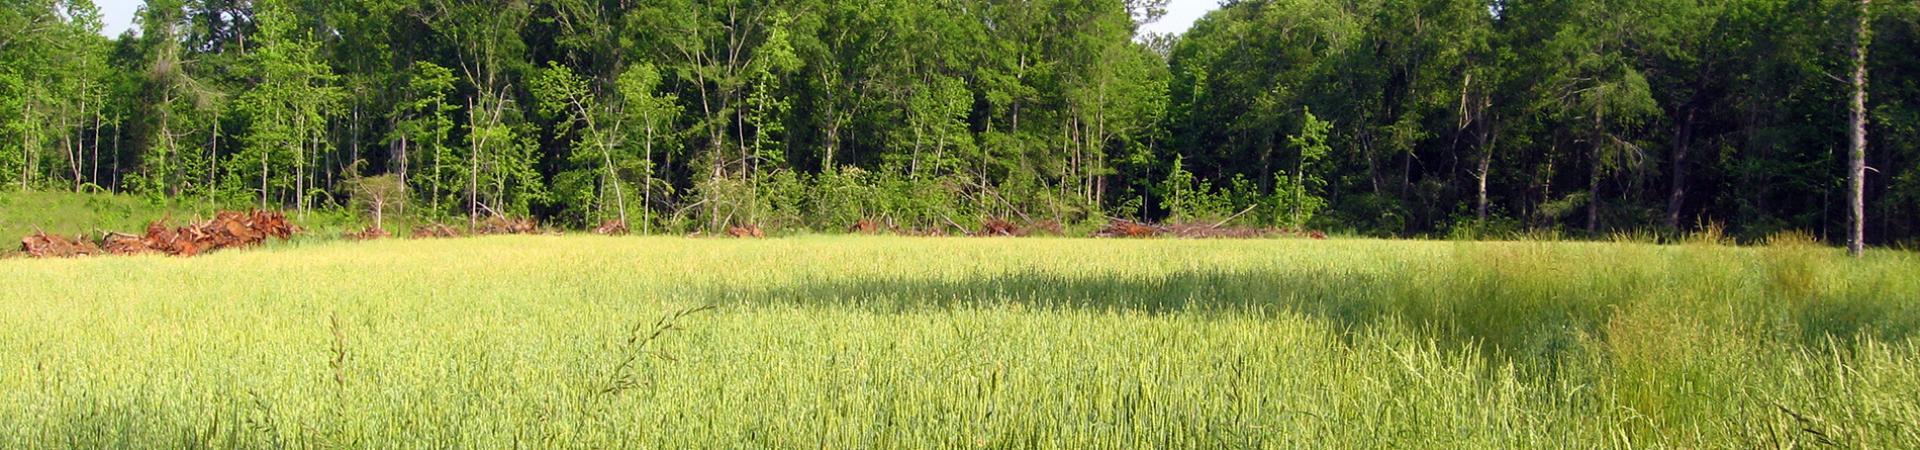 Field at Blanton Creek